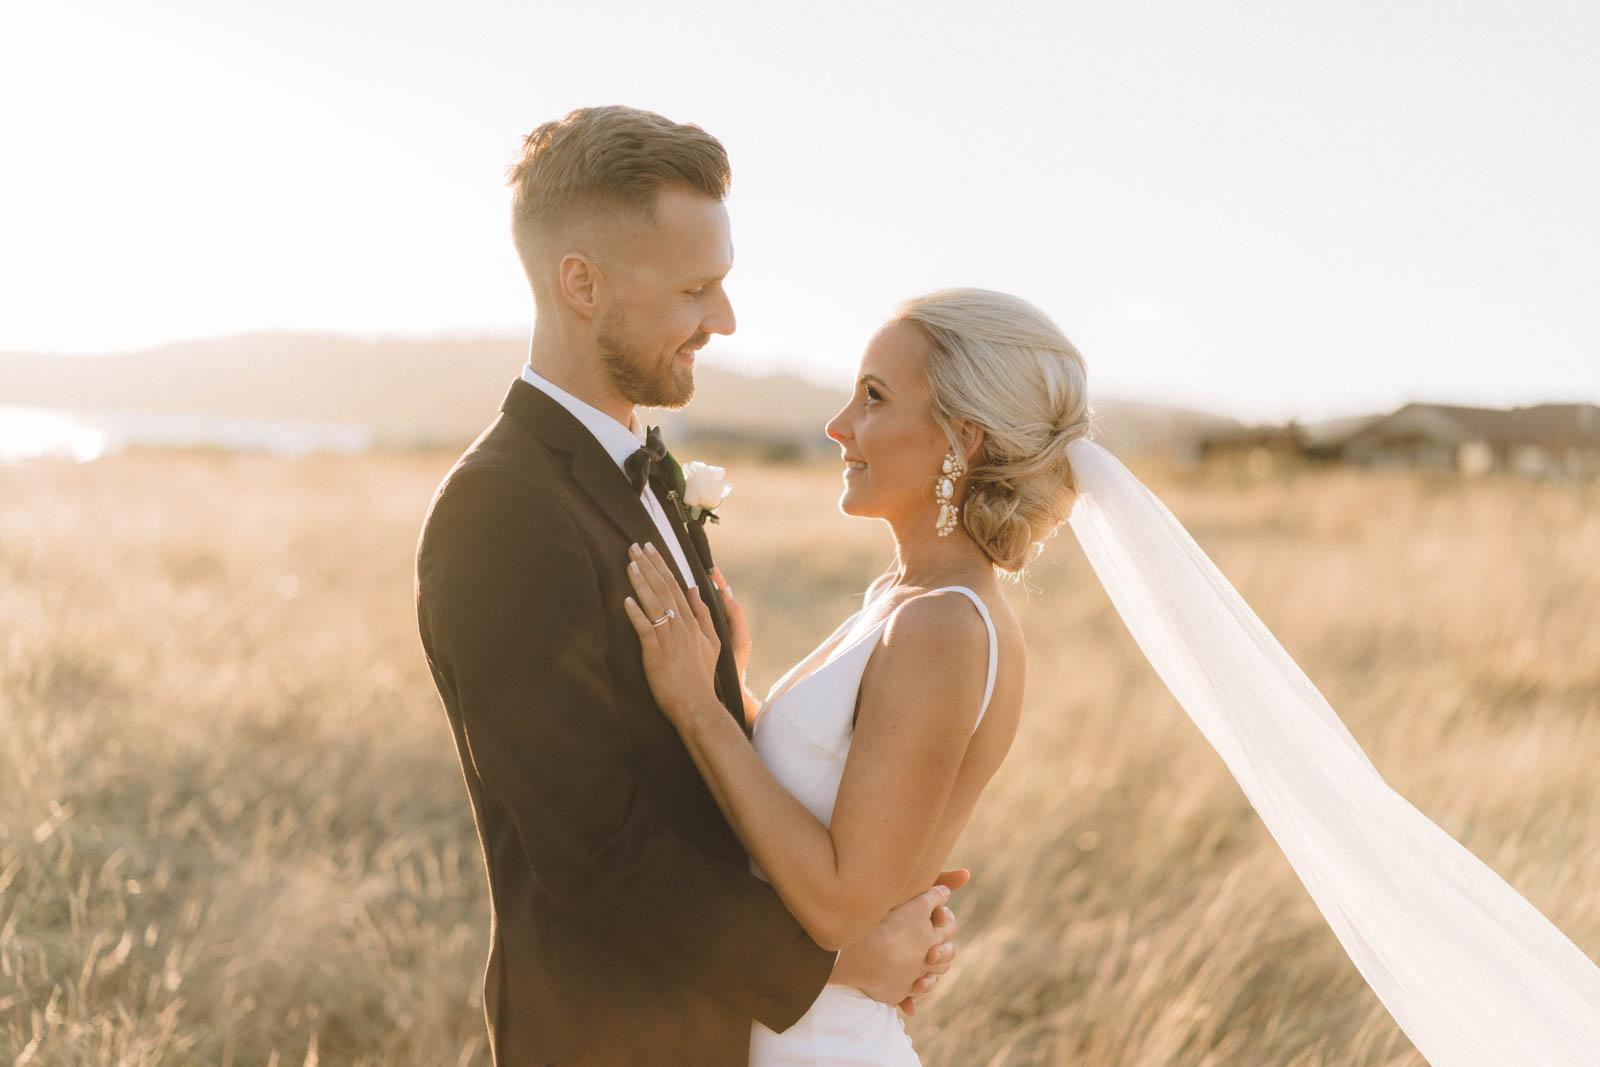 newfound-k-s-hilton-taupo-wedding-photographer-070